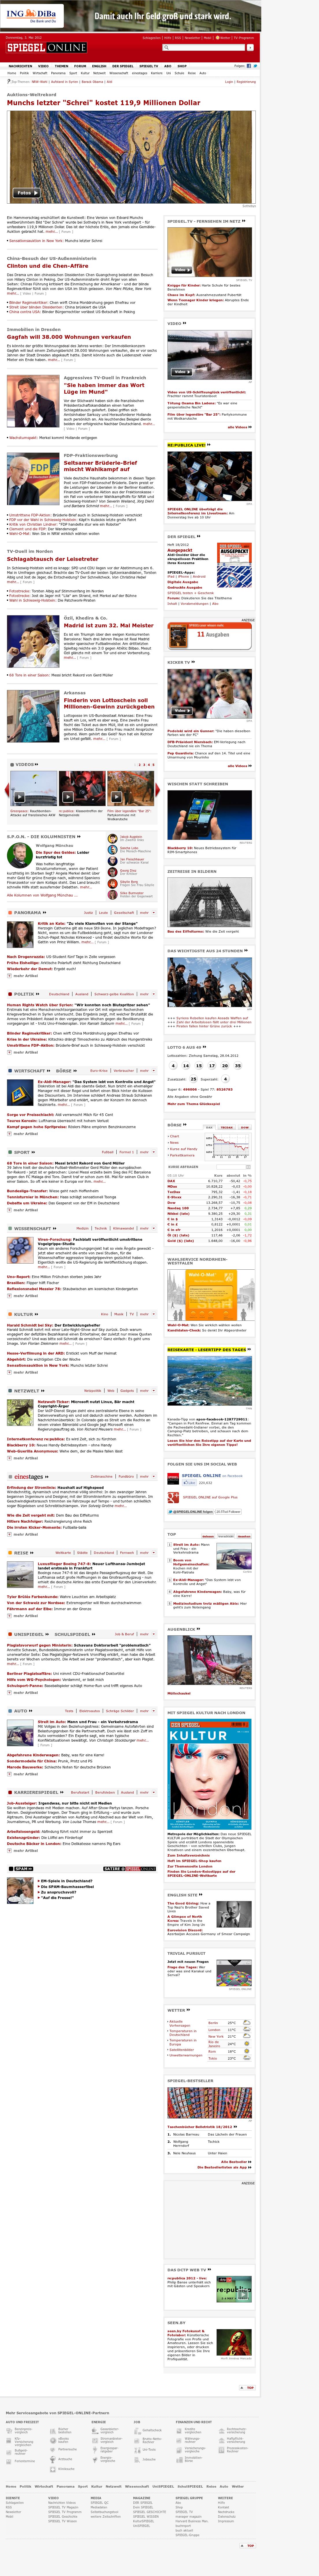 Spiegel Online at Thursday May 3, 2012, 3:11 a.m. UTC